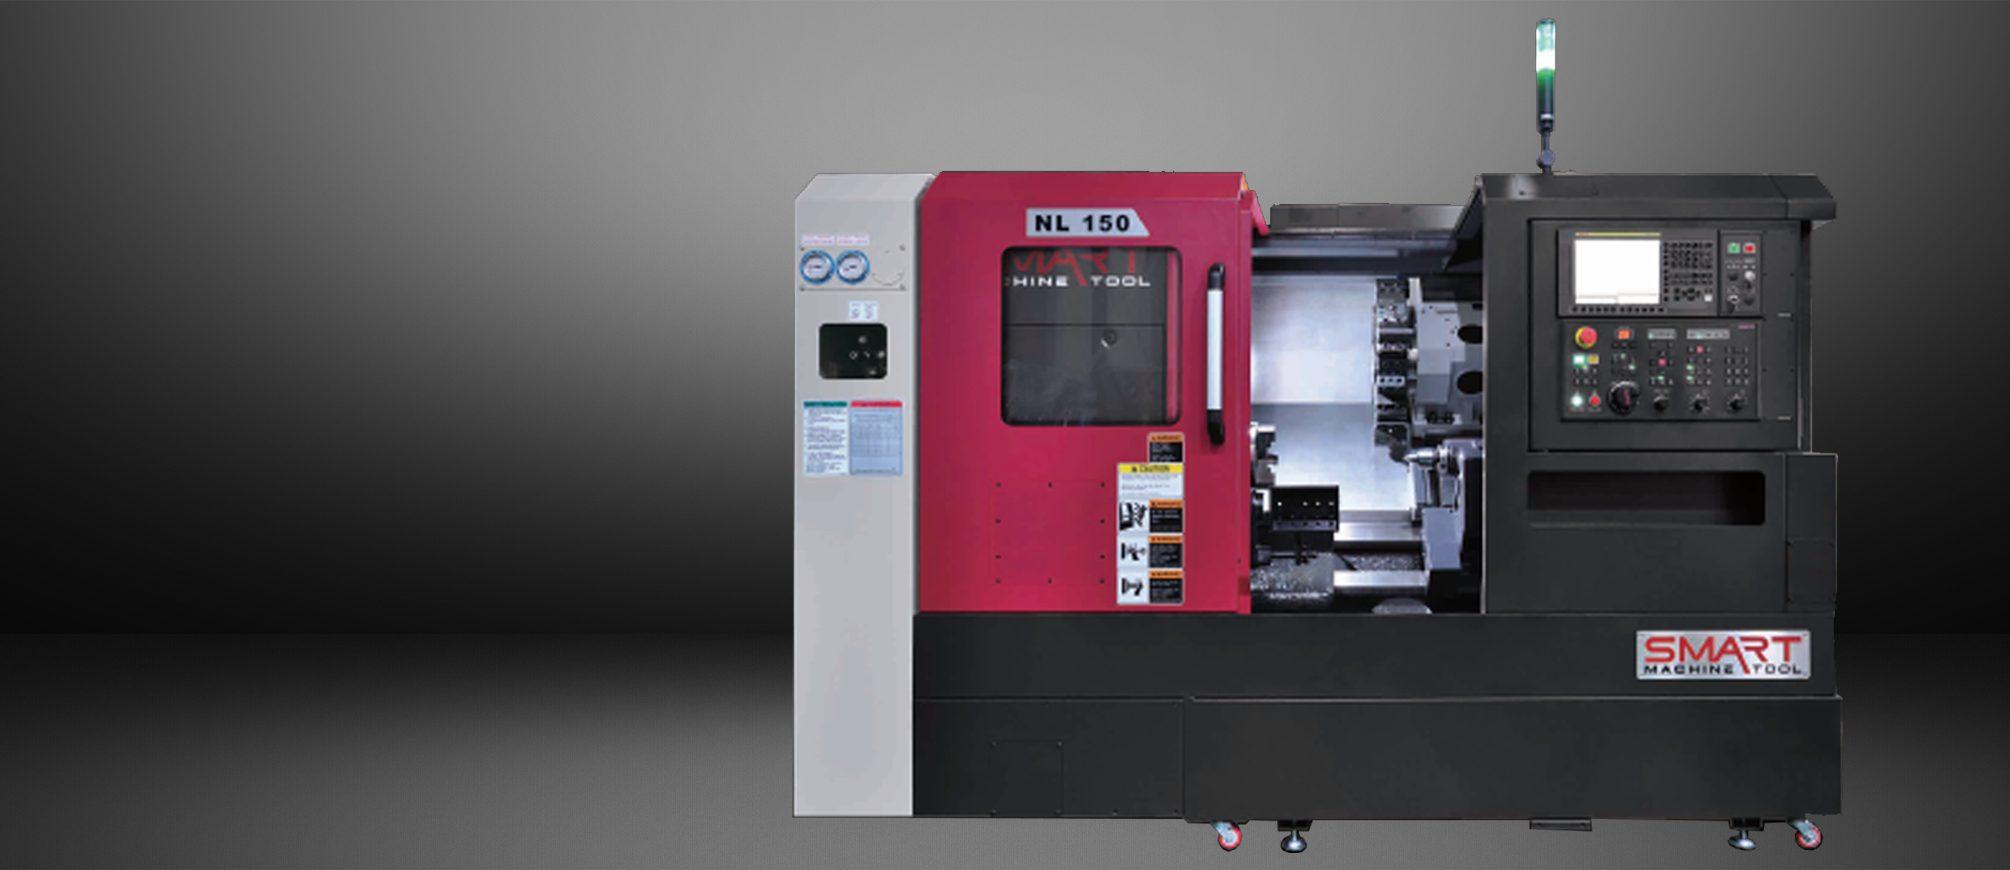 SMART NL 150 – BOX WAY – (6″ CHUCK) 2-Axis CNC Lathes